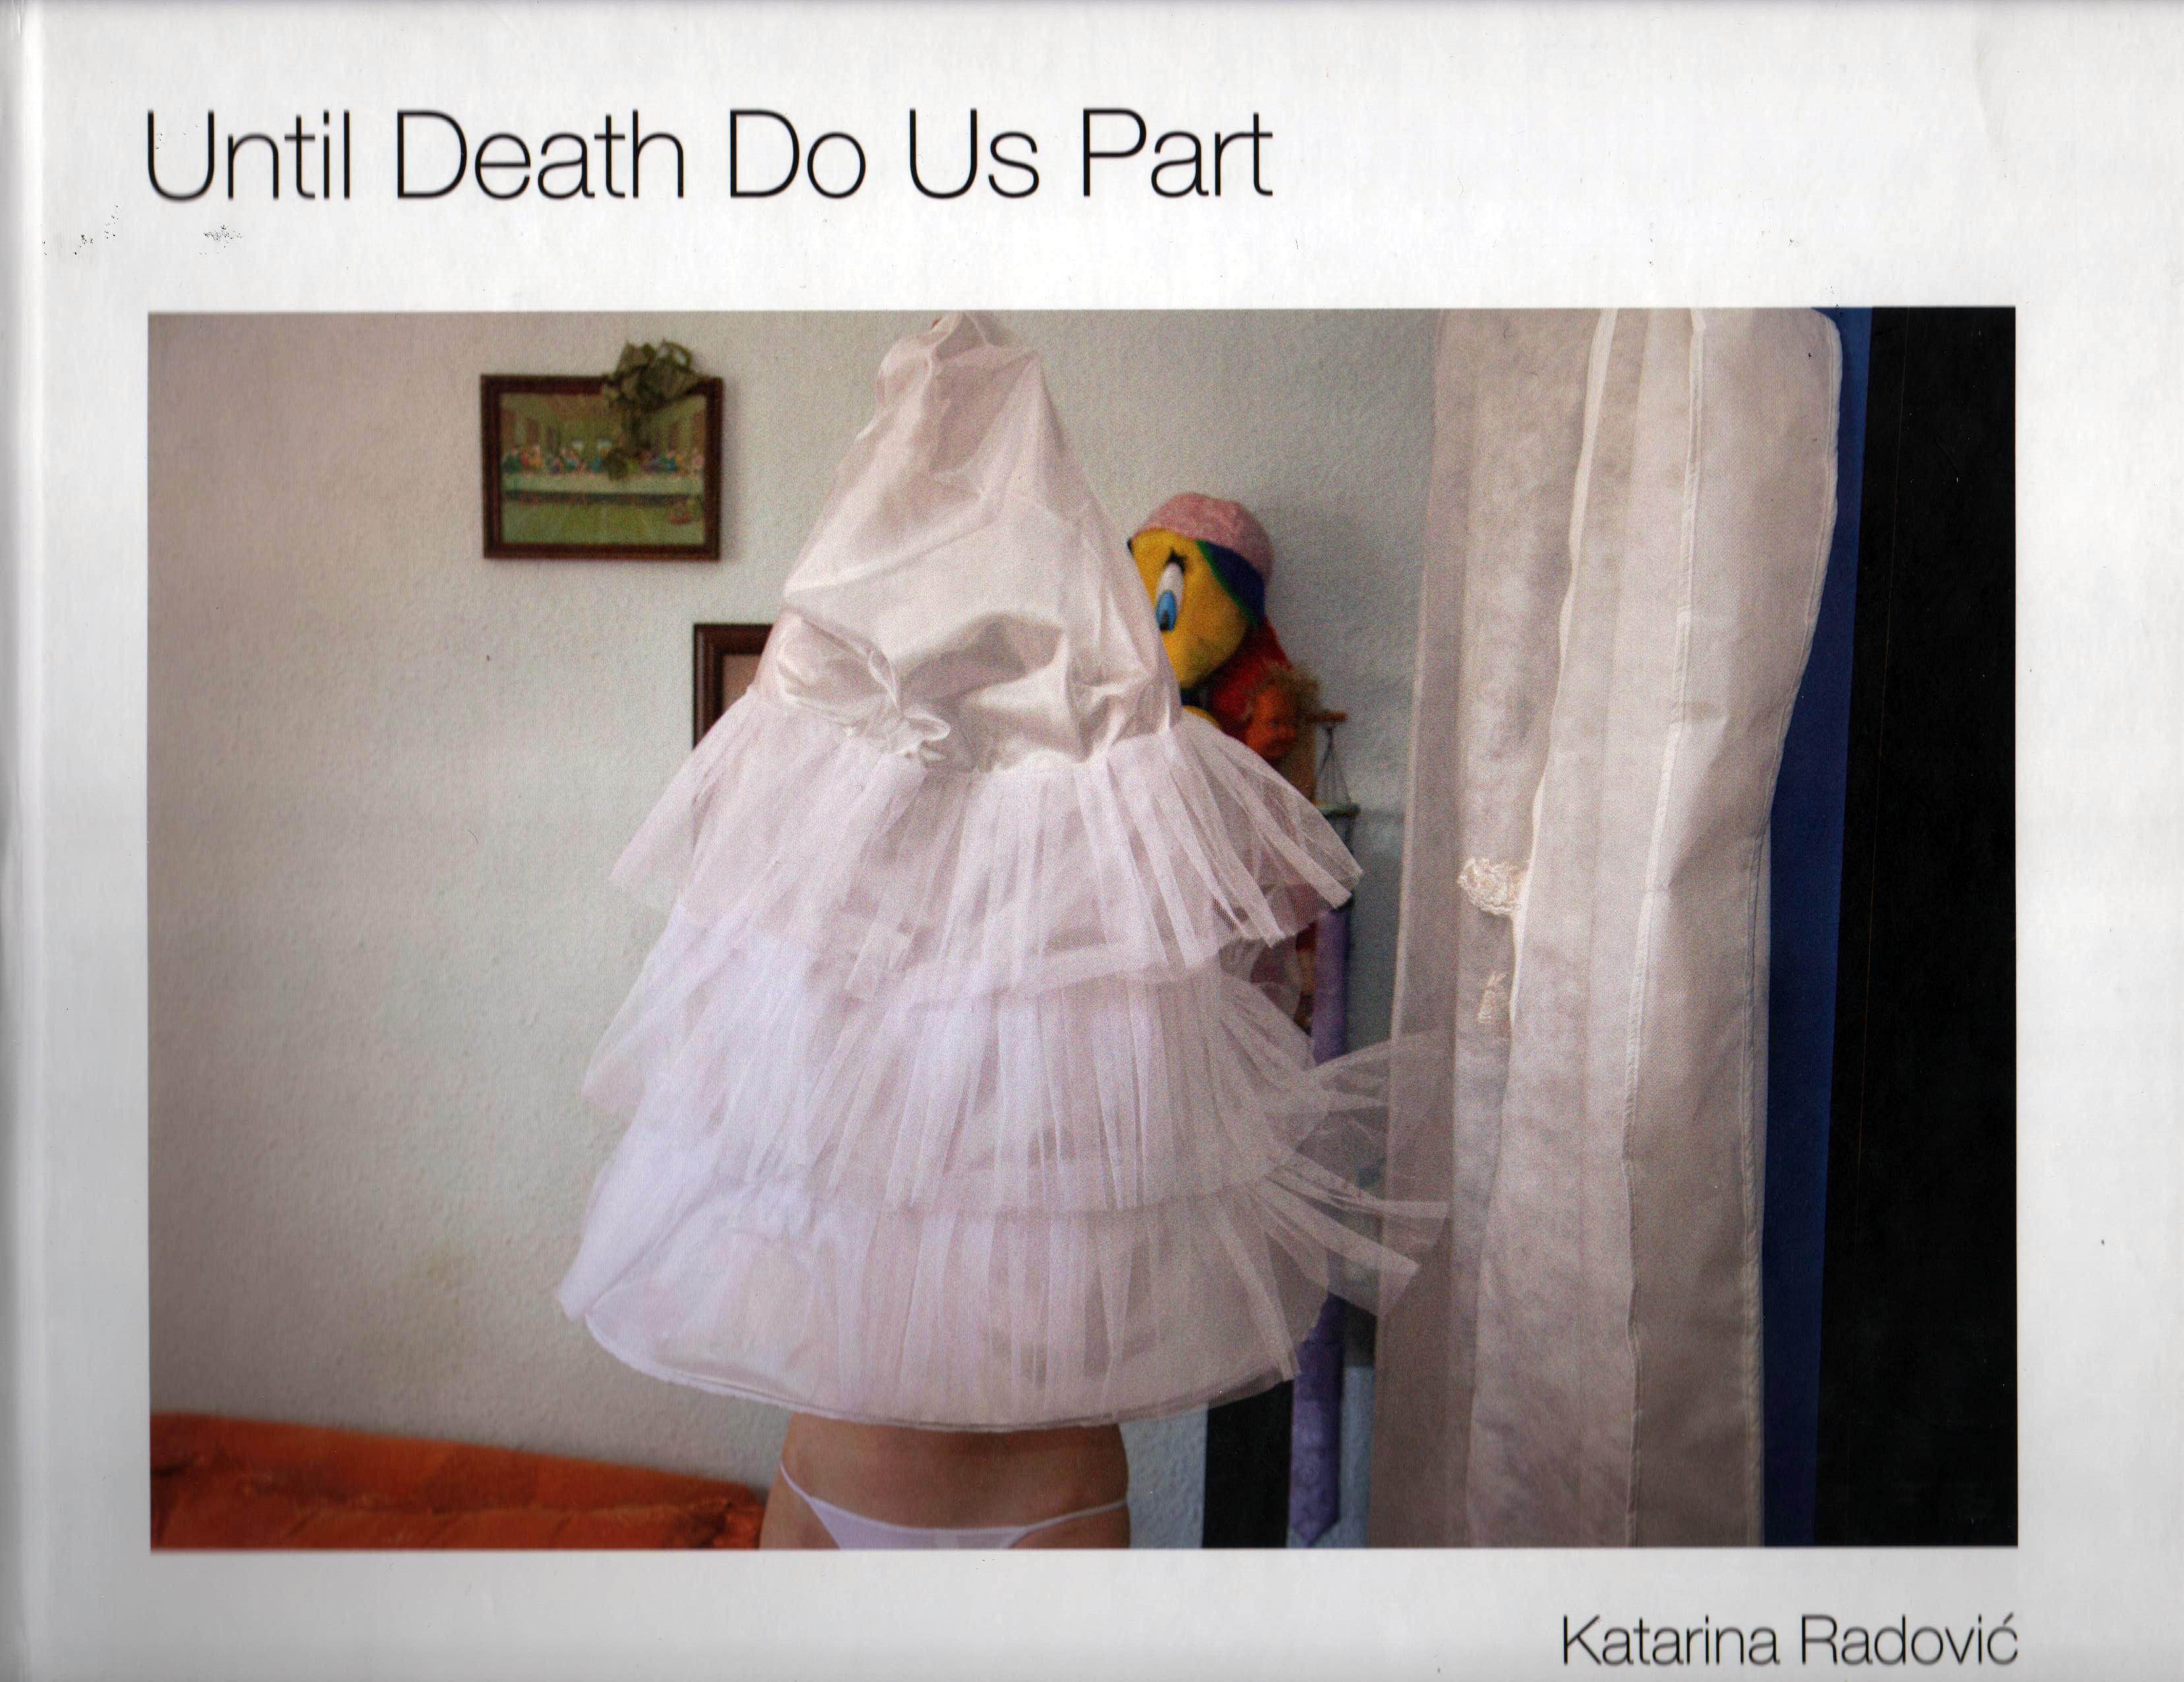 Katarina Radović: Until Death Do Us Part